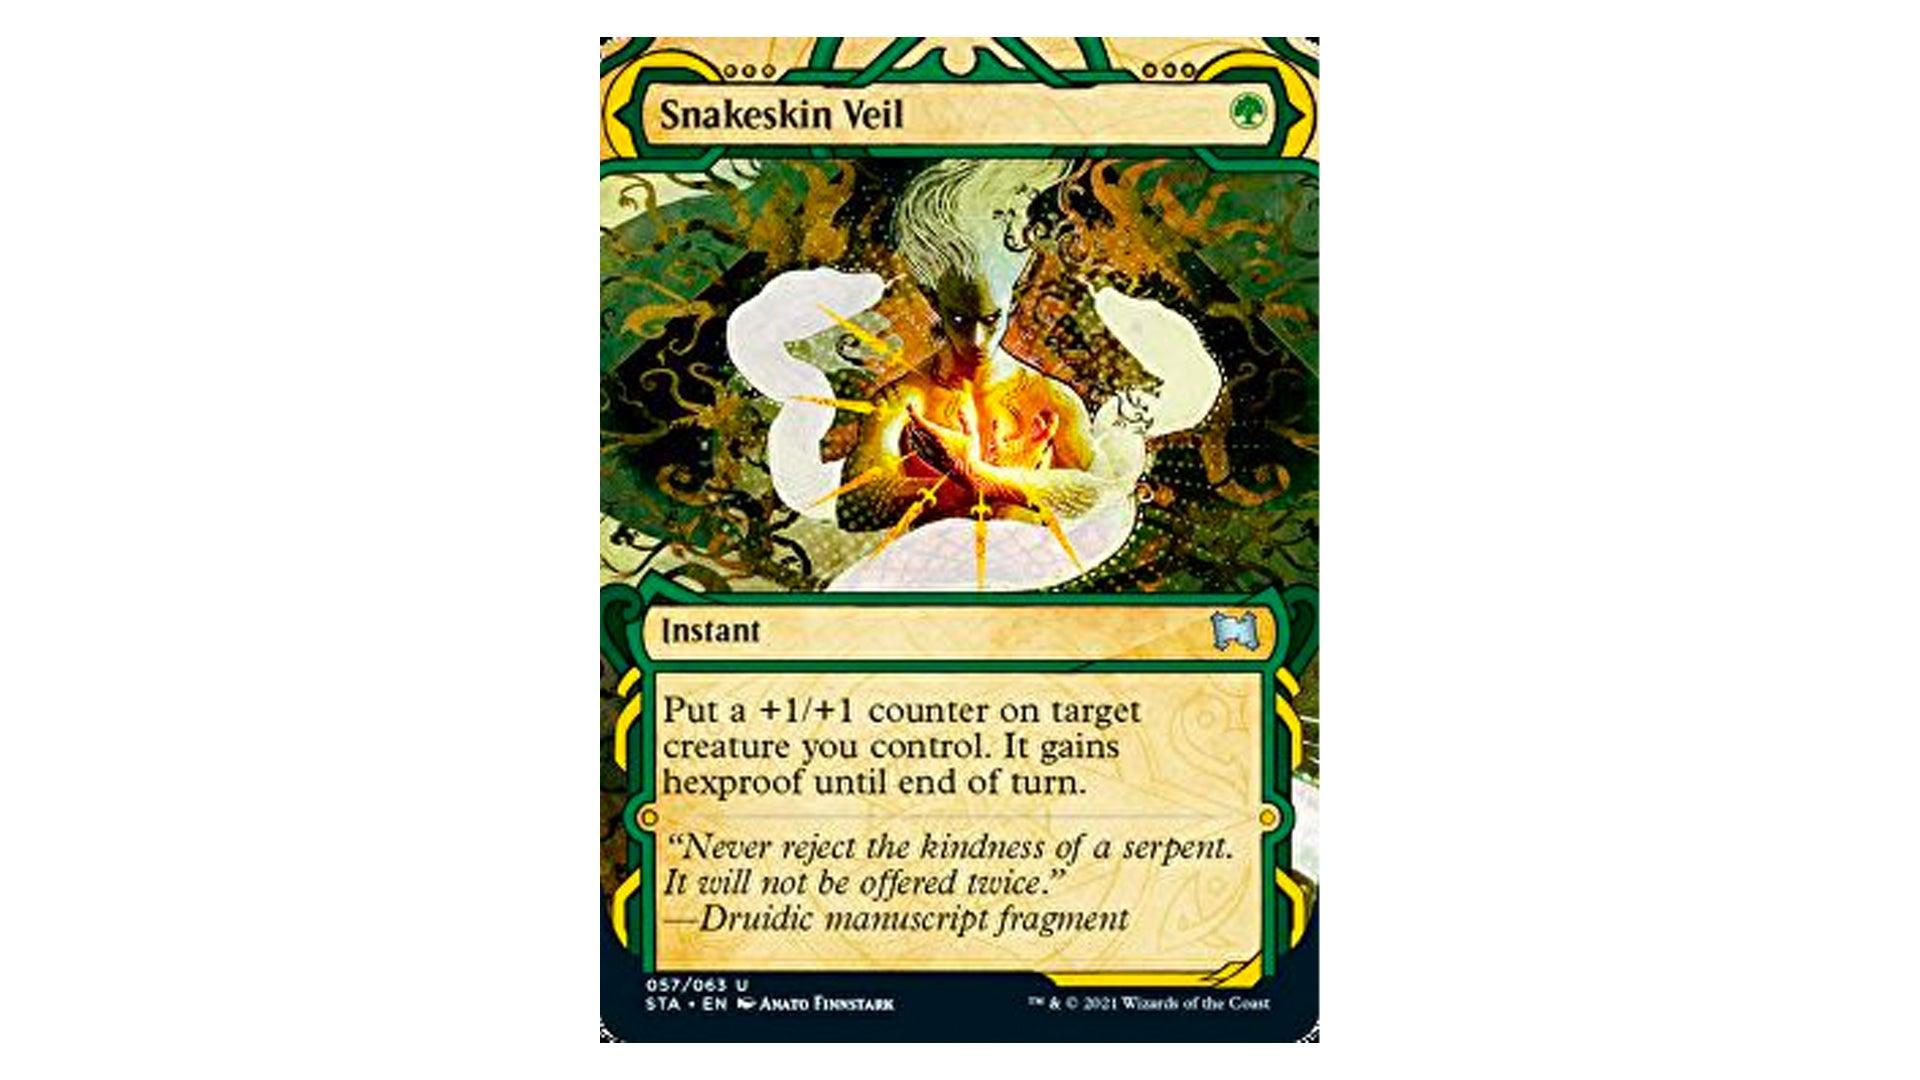 mtg-strixhaven-snakeskin-veil-card.jpg